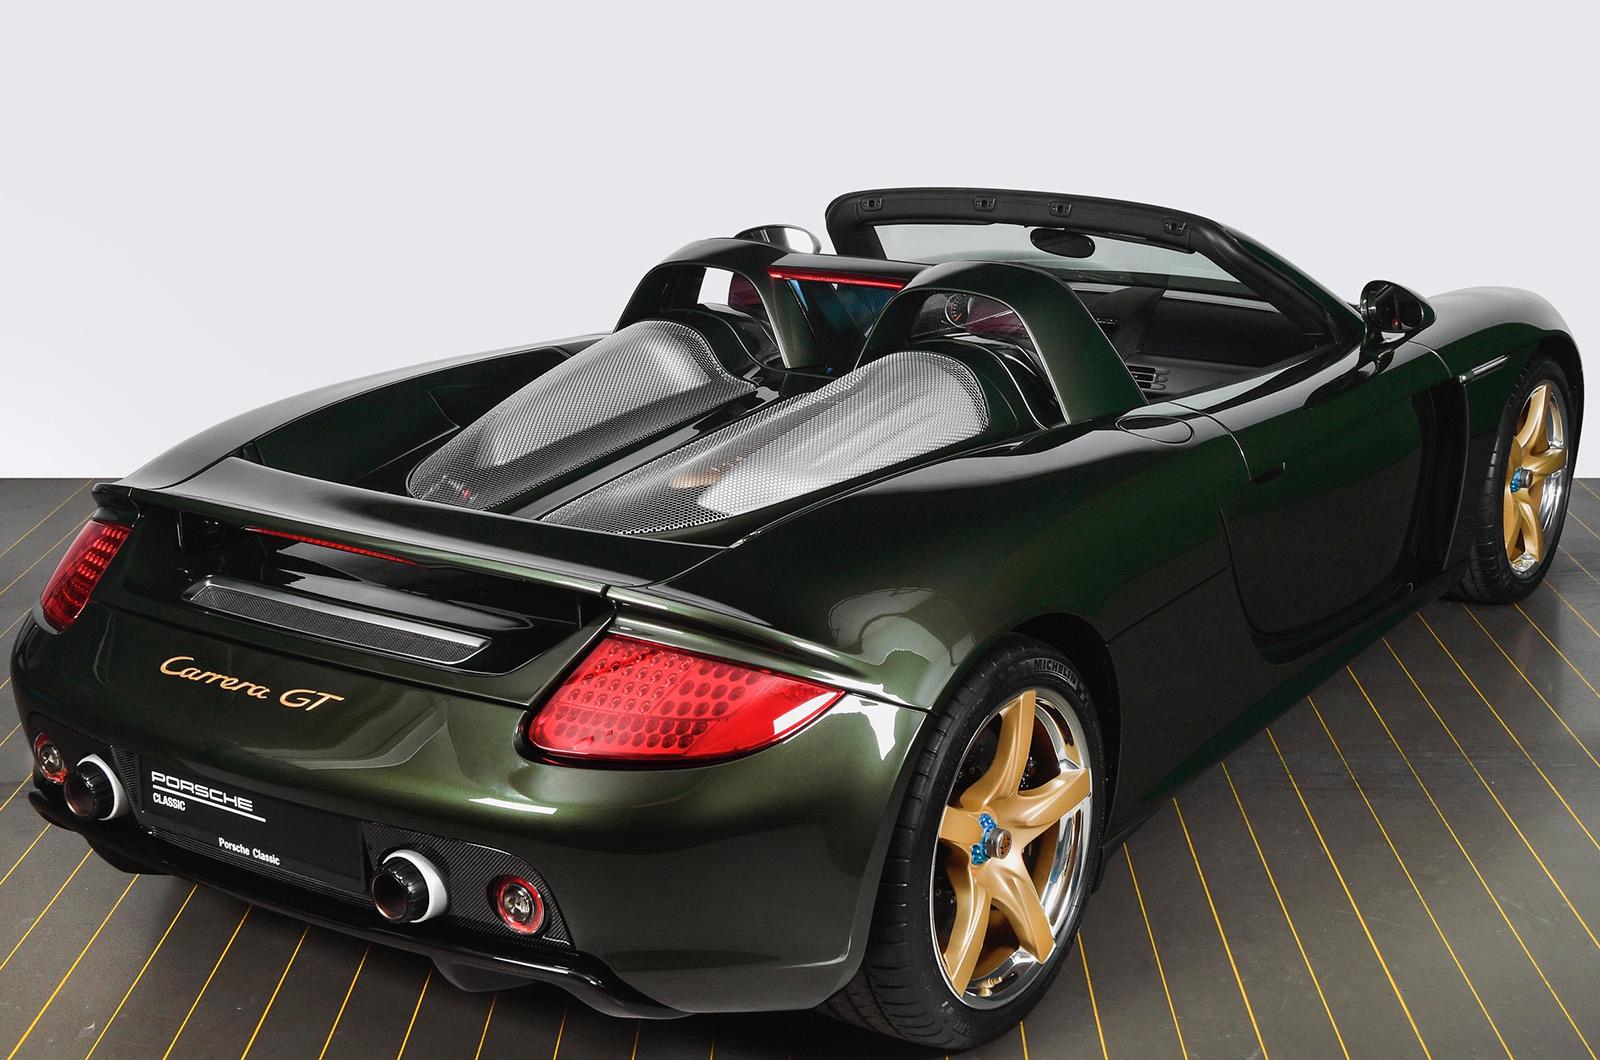 Porsche supercar rebuilt from scratch in unique style